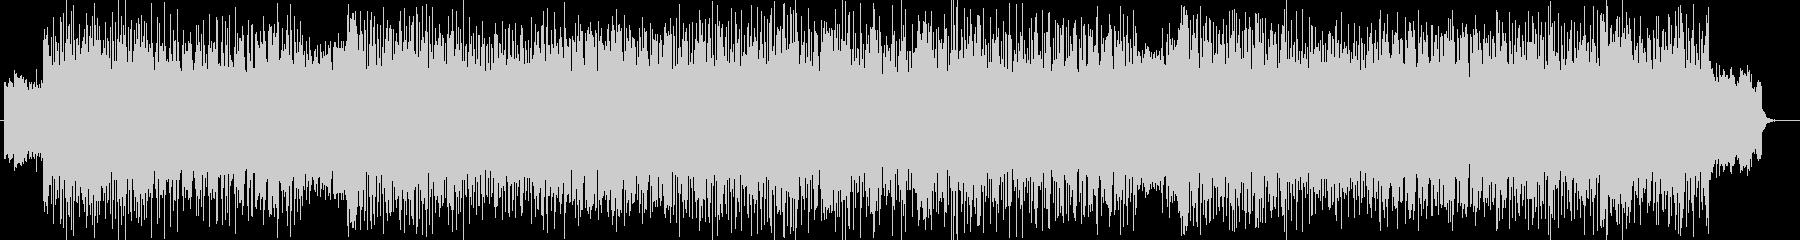 「HR/HM」「DARK」BGM265の未再生の波形